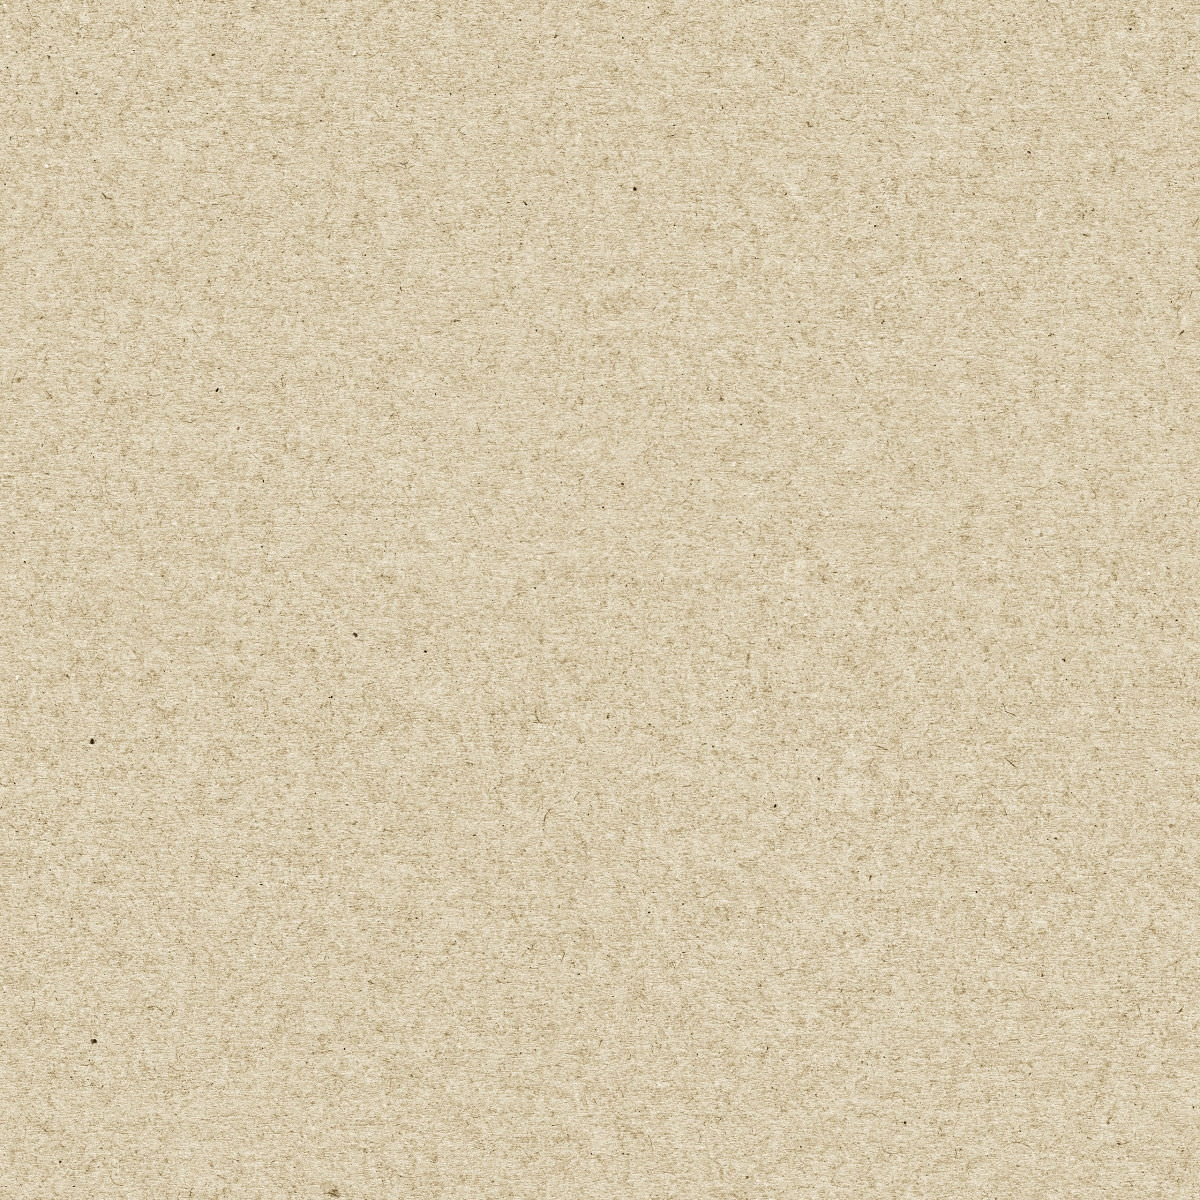 Seamless Retro Paper Texture